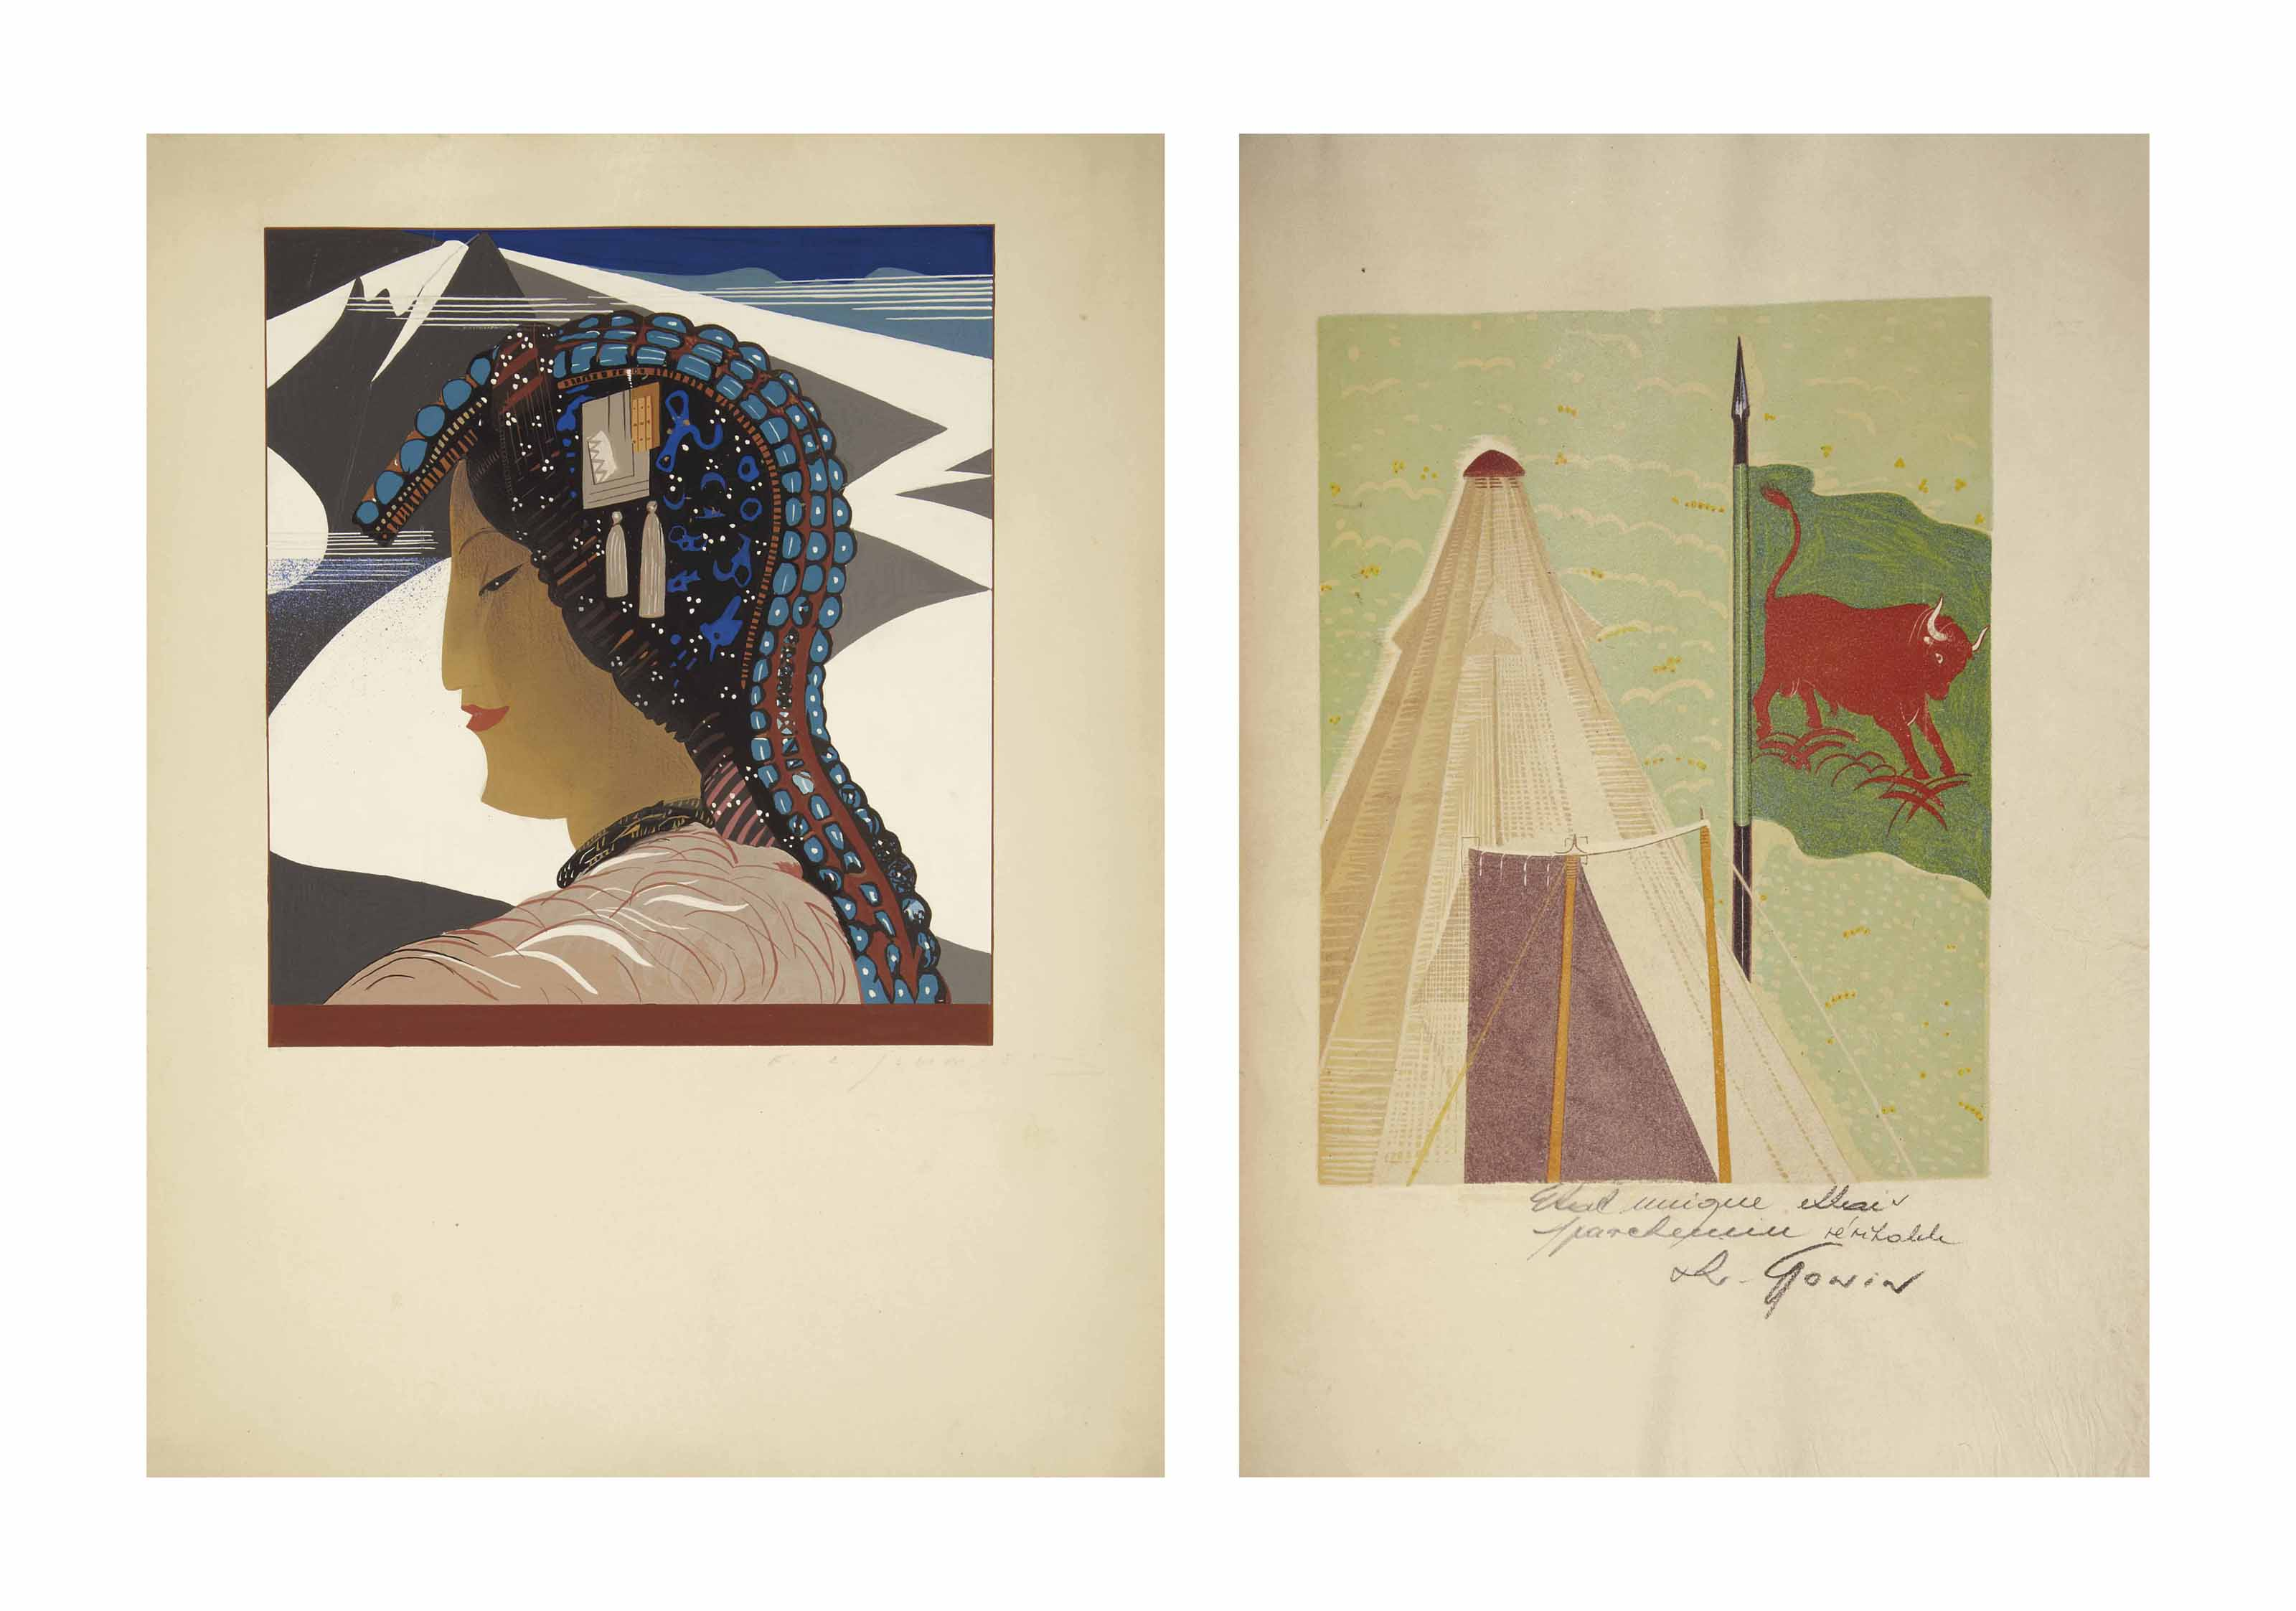 [SCHMIED] -- KIPLING, Rudyard (1865-1936). Kim. Traduit par Louis Fabulet et Ch. Fountaine-Walker. Illustrations de F. L. Schmied. Lausanne: Gonin et Cie., 1930.